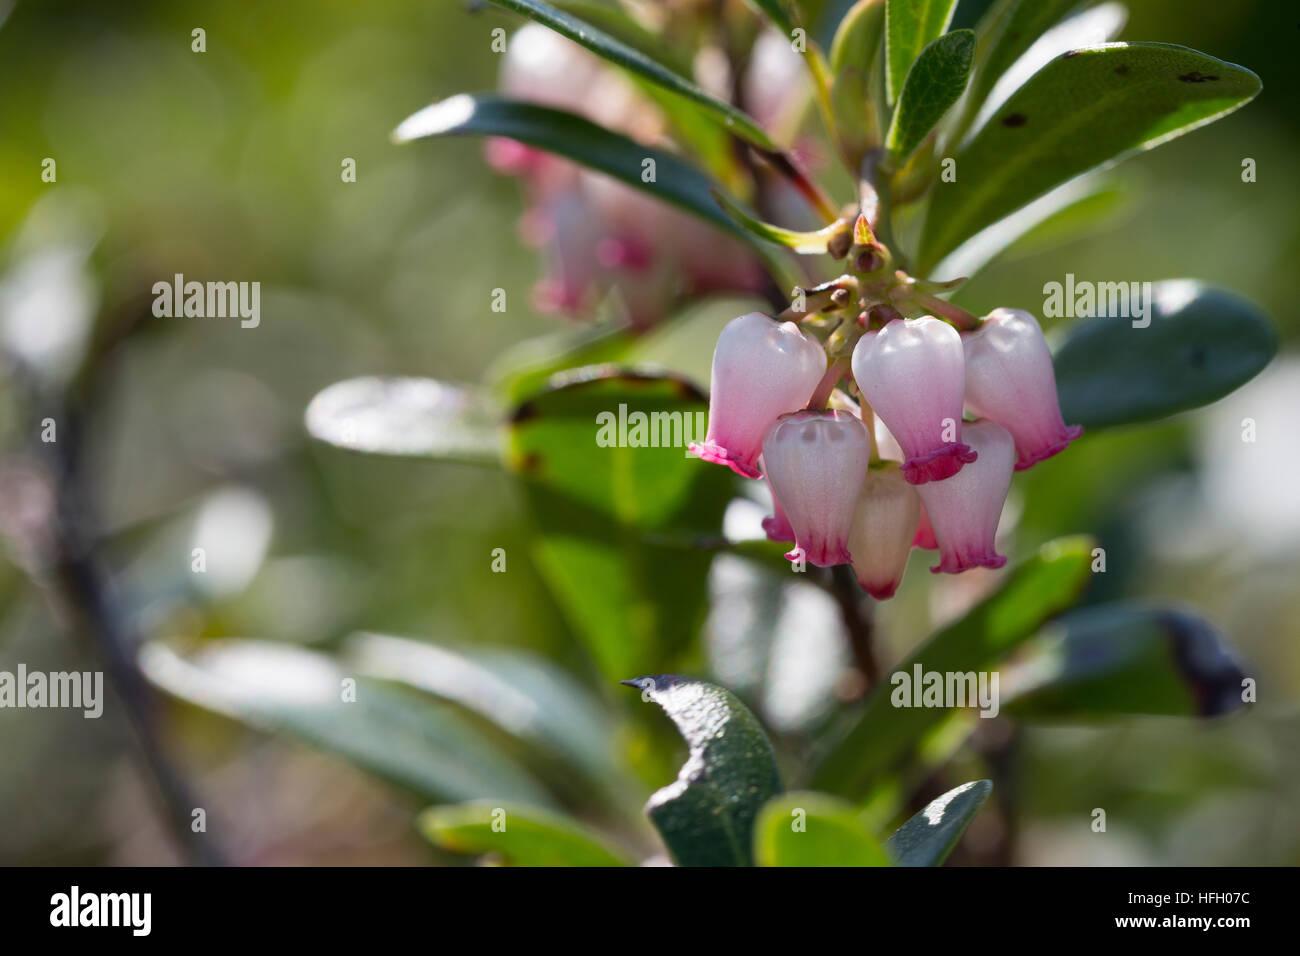 Echte Bärentraube, Immergrüne Bärentraube, Arctostaphylos uva-ursi, kinnikinnick, pinemat manzanita, - Stock Image